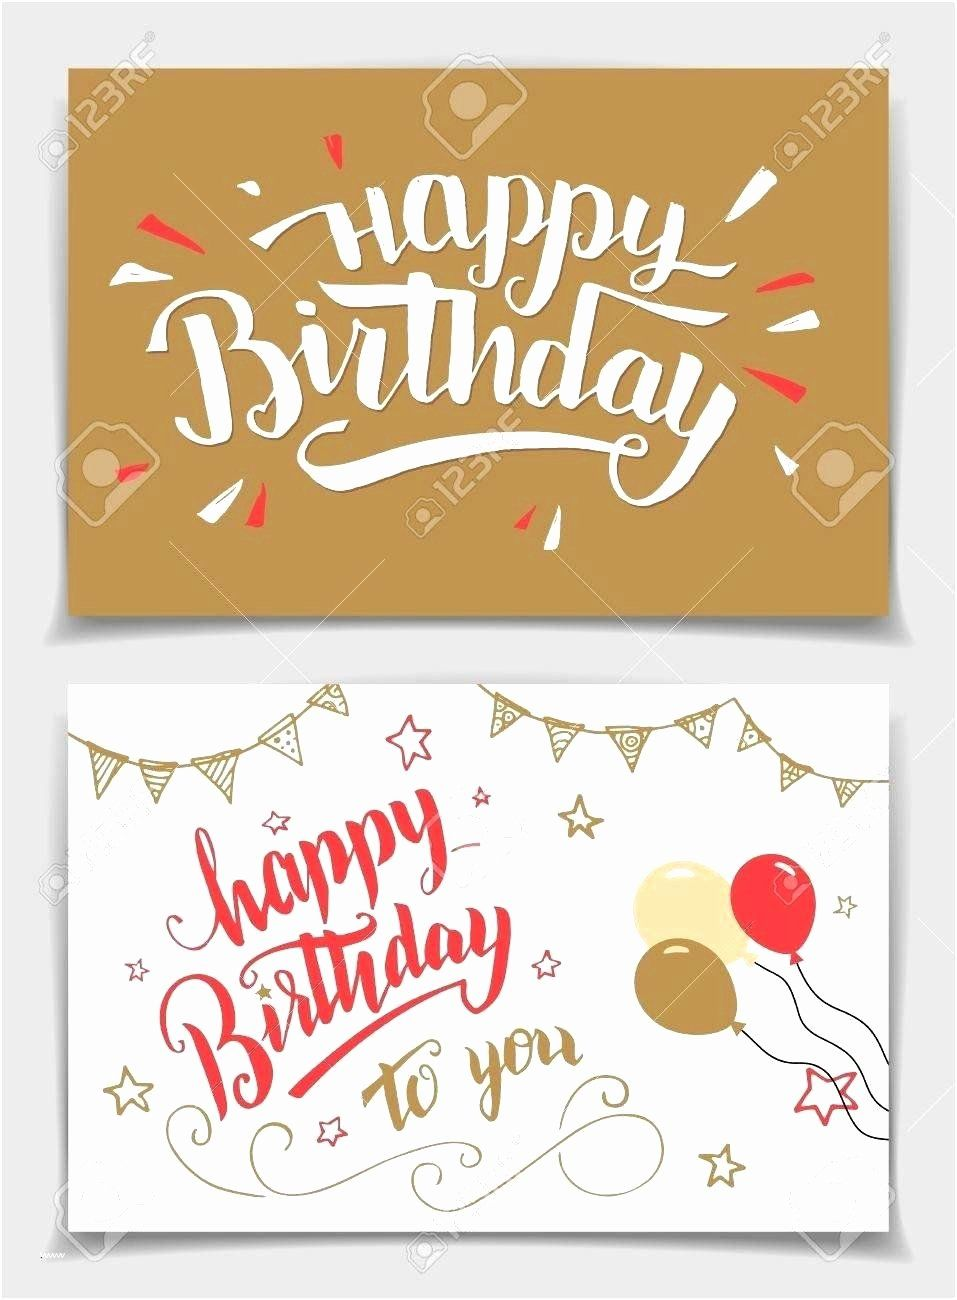 Thank You Cards Graduation Lovely Graduation Thank You Wording Luxury This High School Gra Sister Birthday Card Birthday Card Design Best Friend Birthday Cards